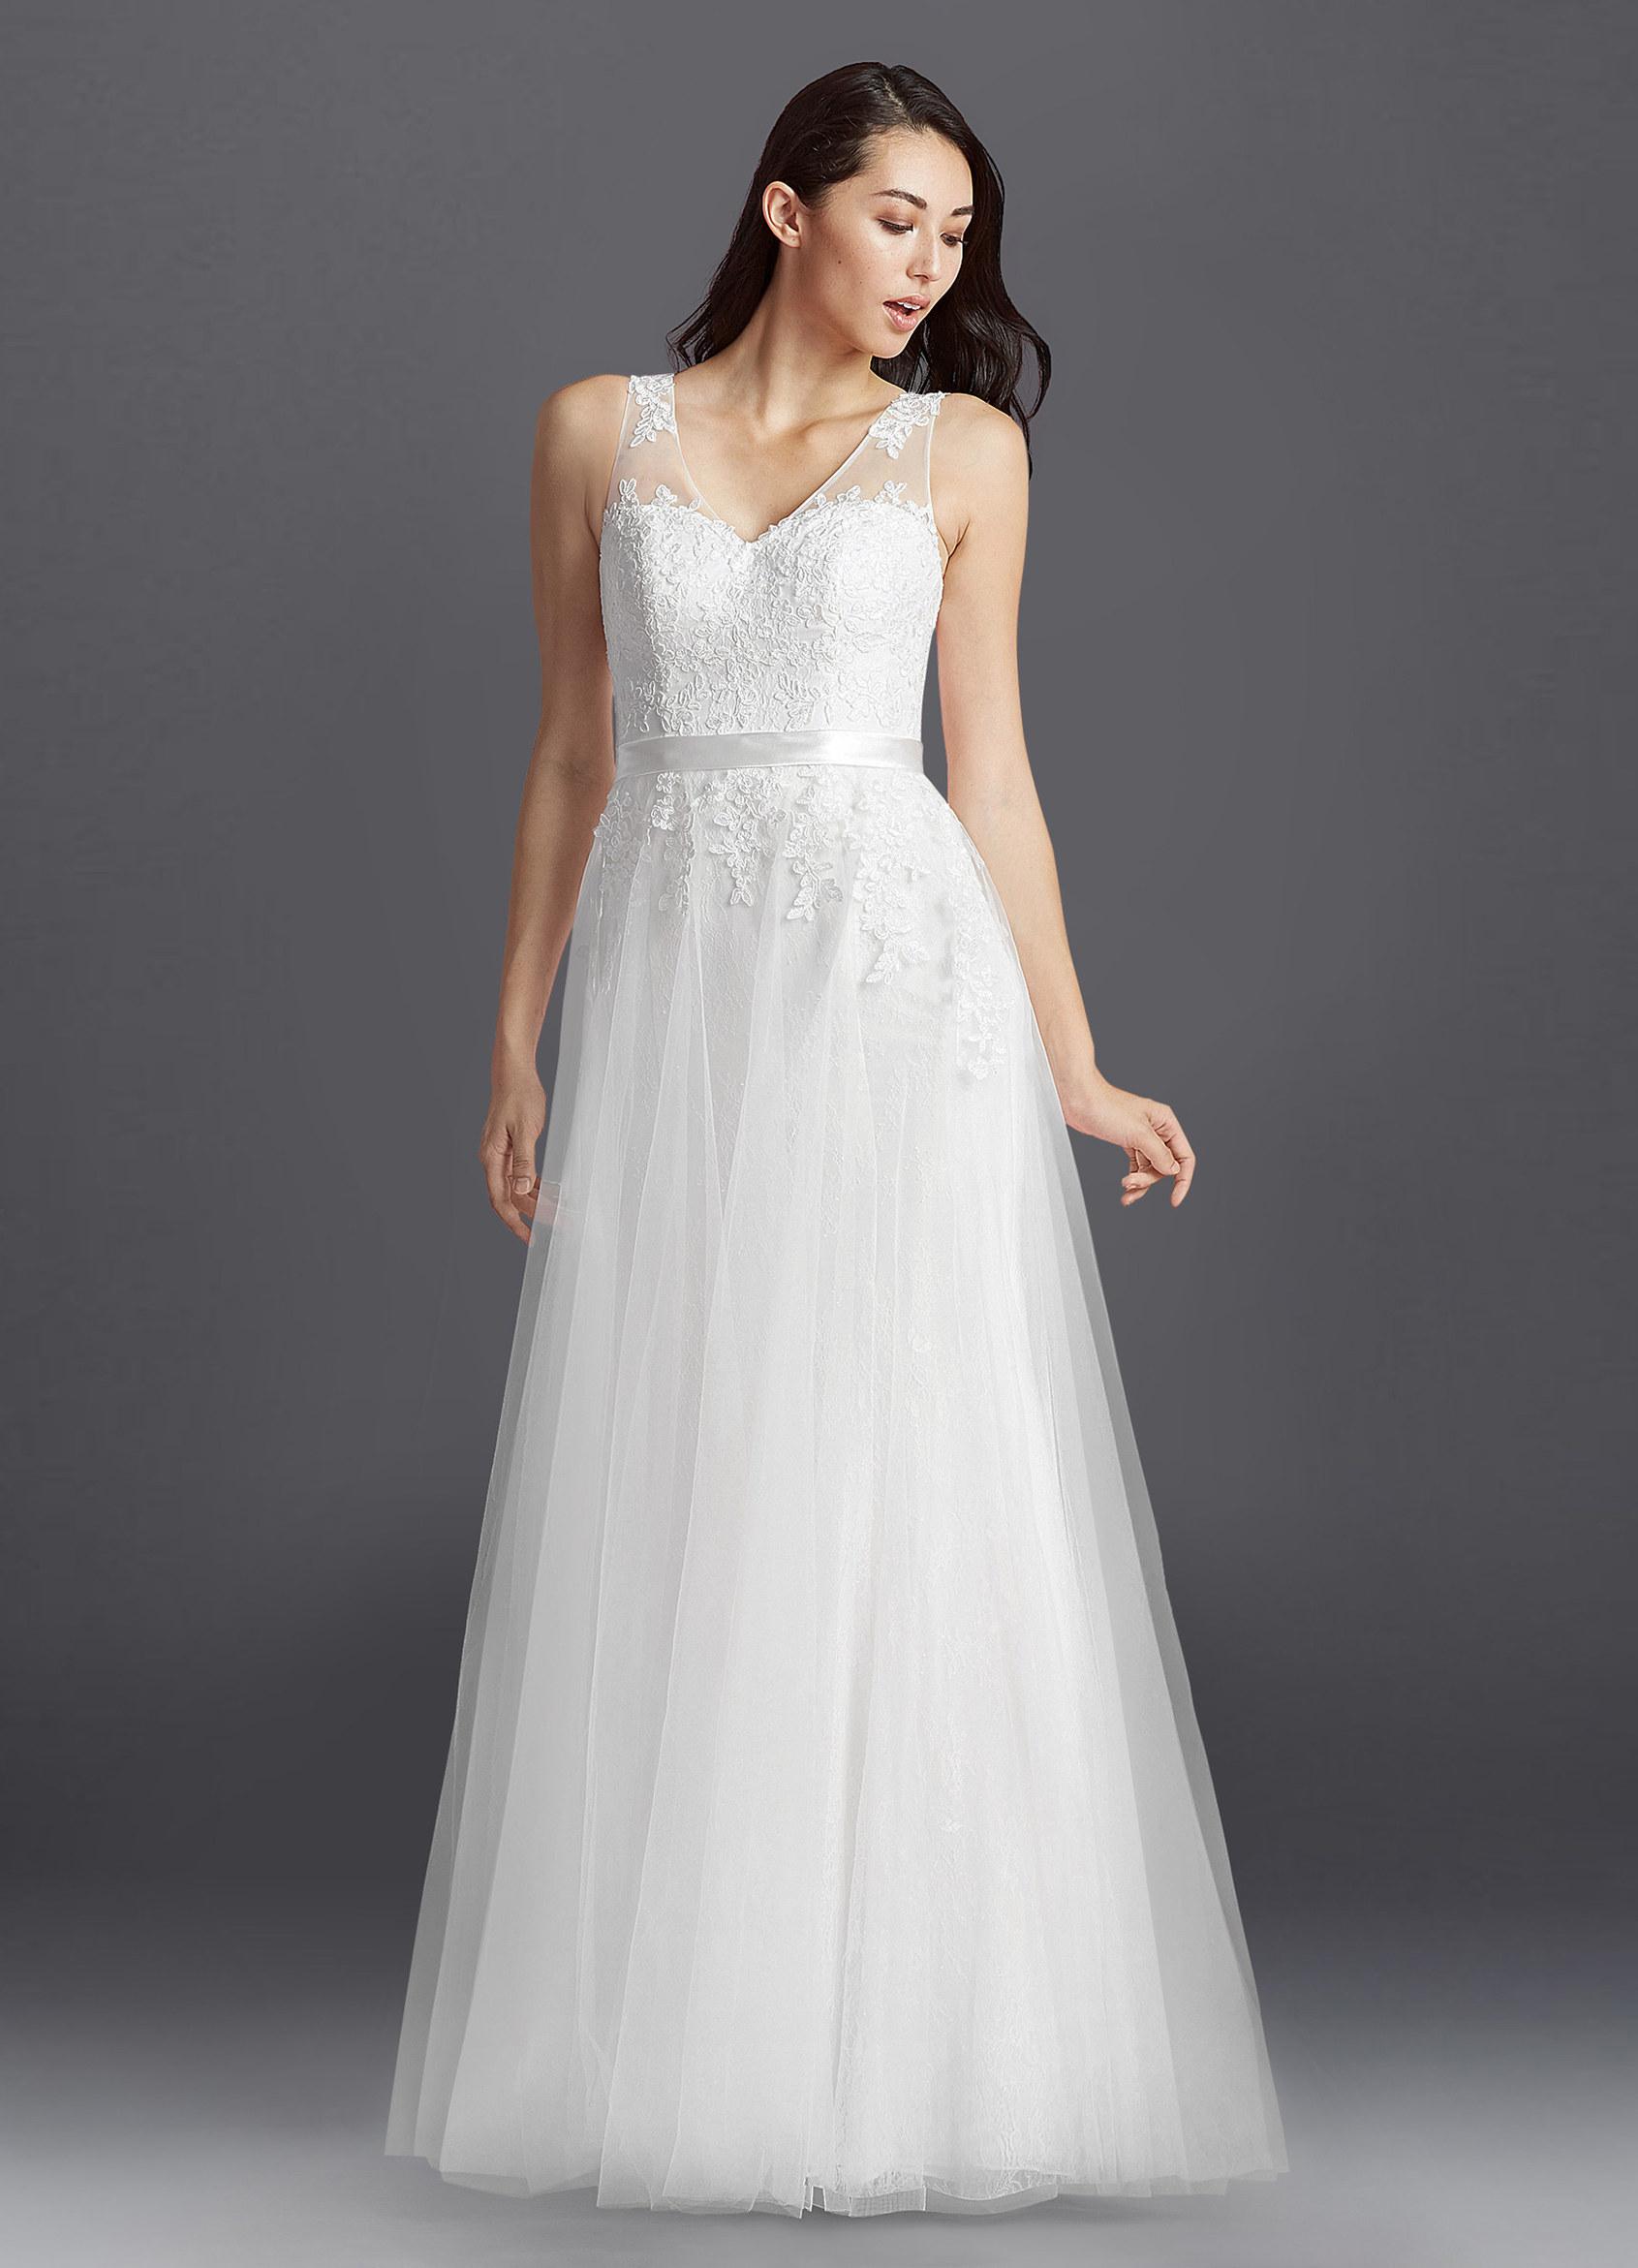 Robyn Bg Sample Dress